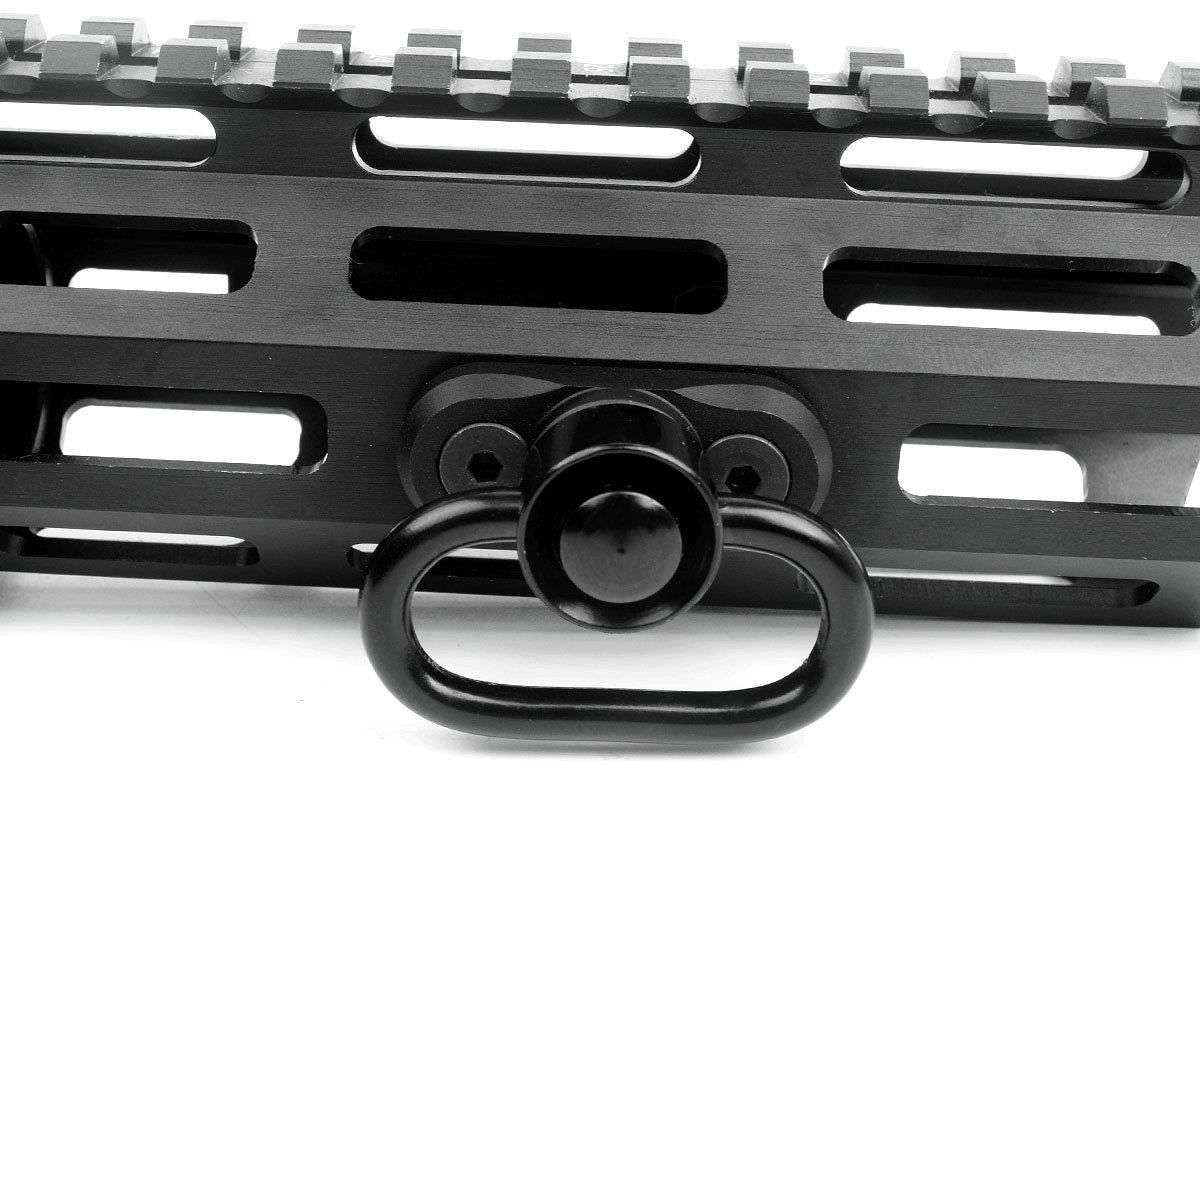 CRUSHUNT M-lok QD Sling Mount Sling Swivel 1.25 inch Adapter Attachment M lok Hand-Guard Set by CRUSHUNT (Image #2)